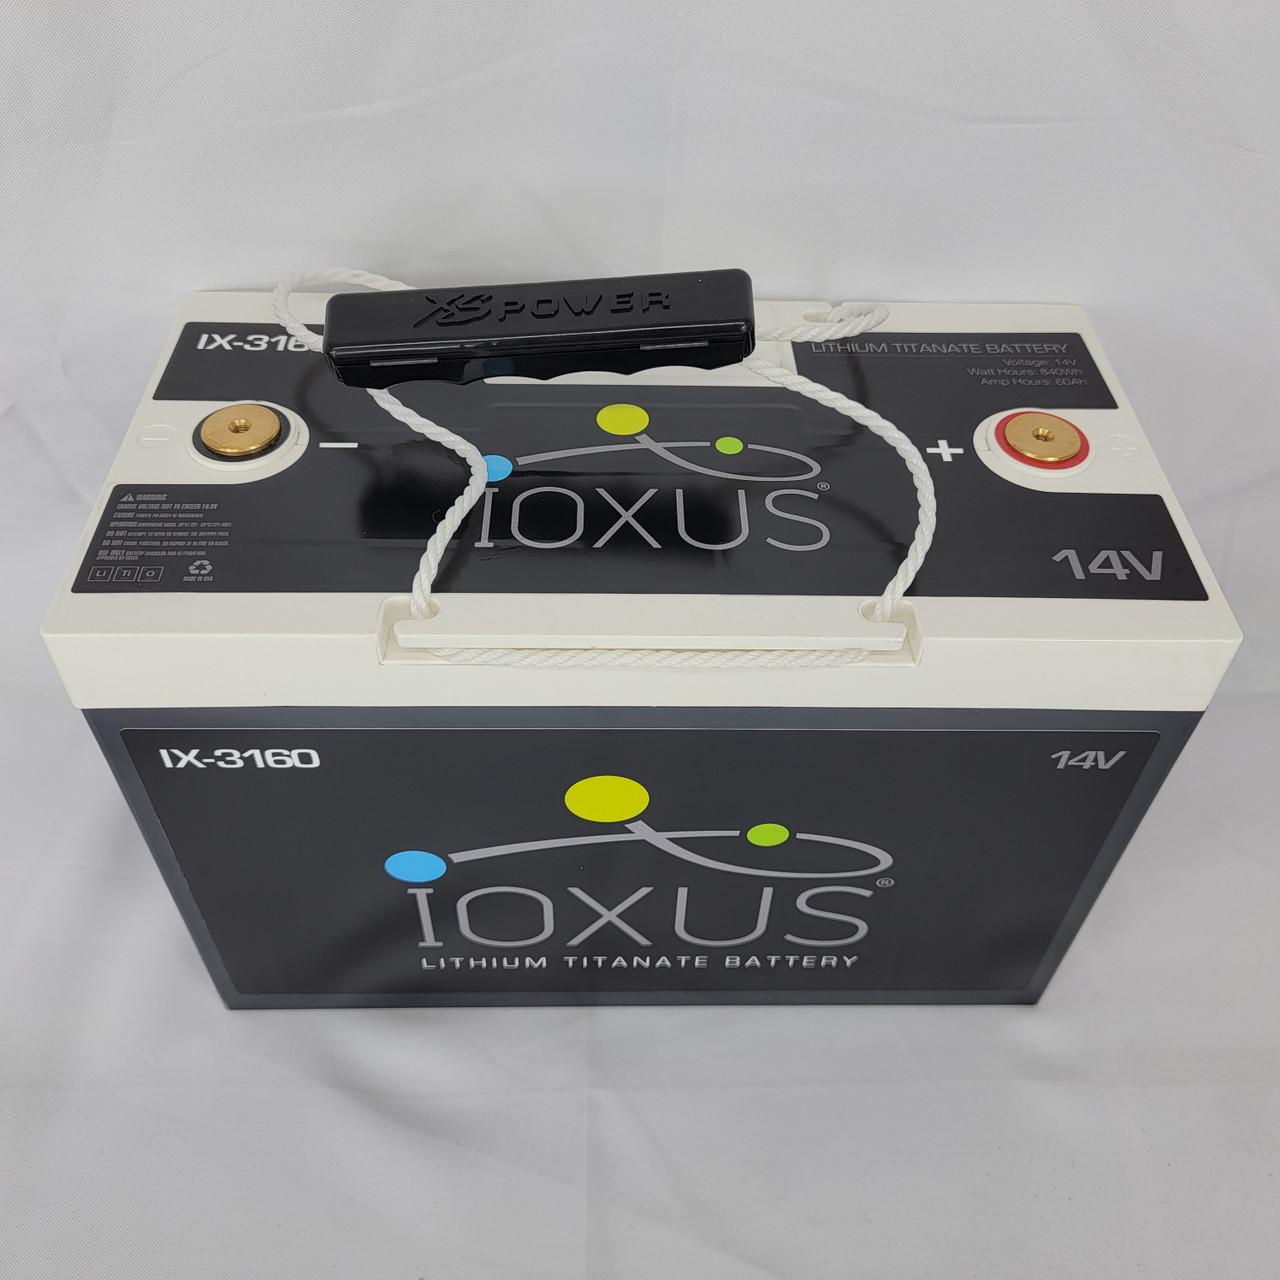 XS Power/Ioxus 60Ah Lithium LTO Battery 10,000 RMS handling